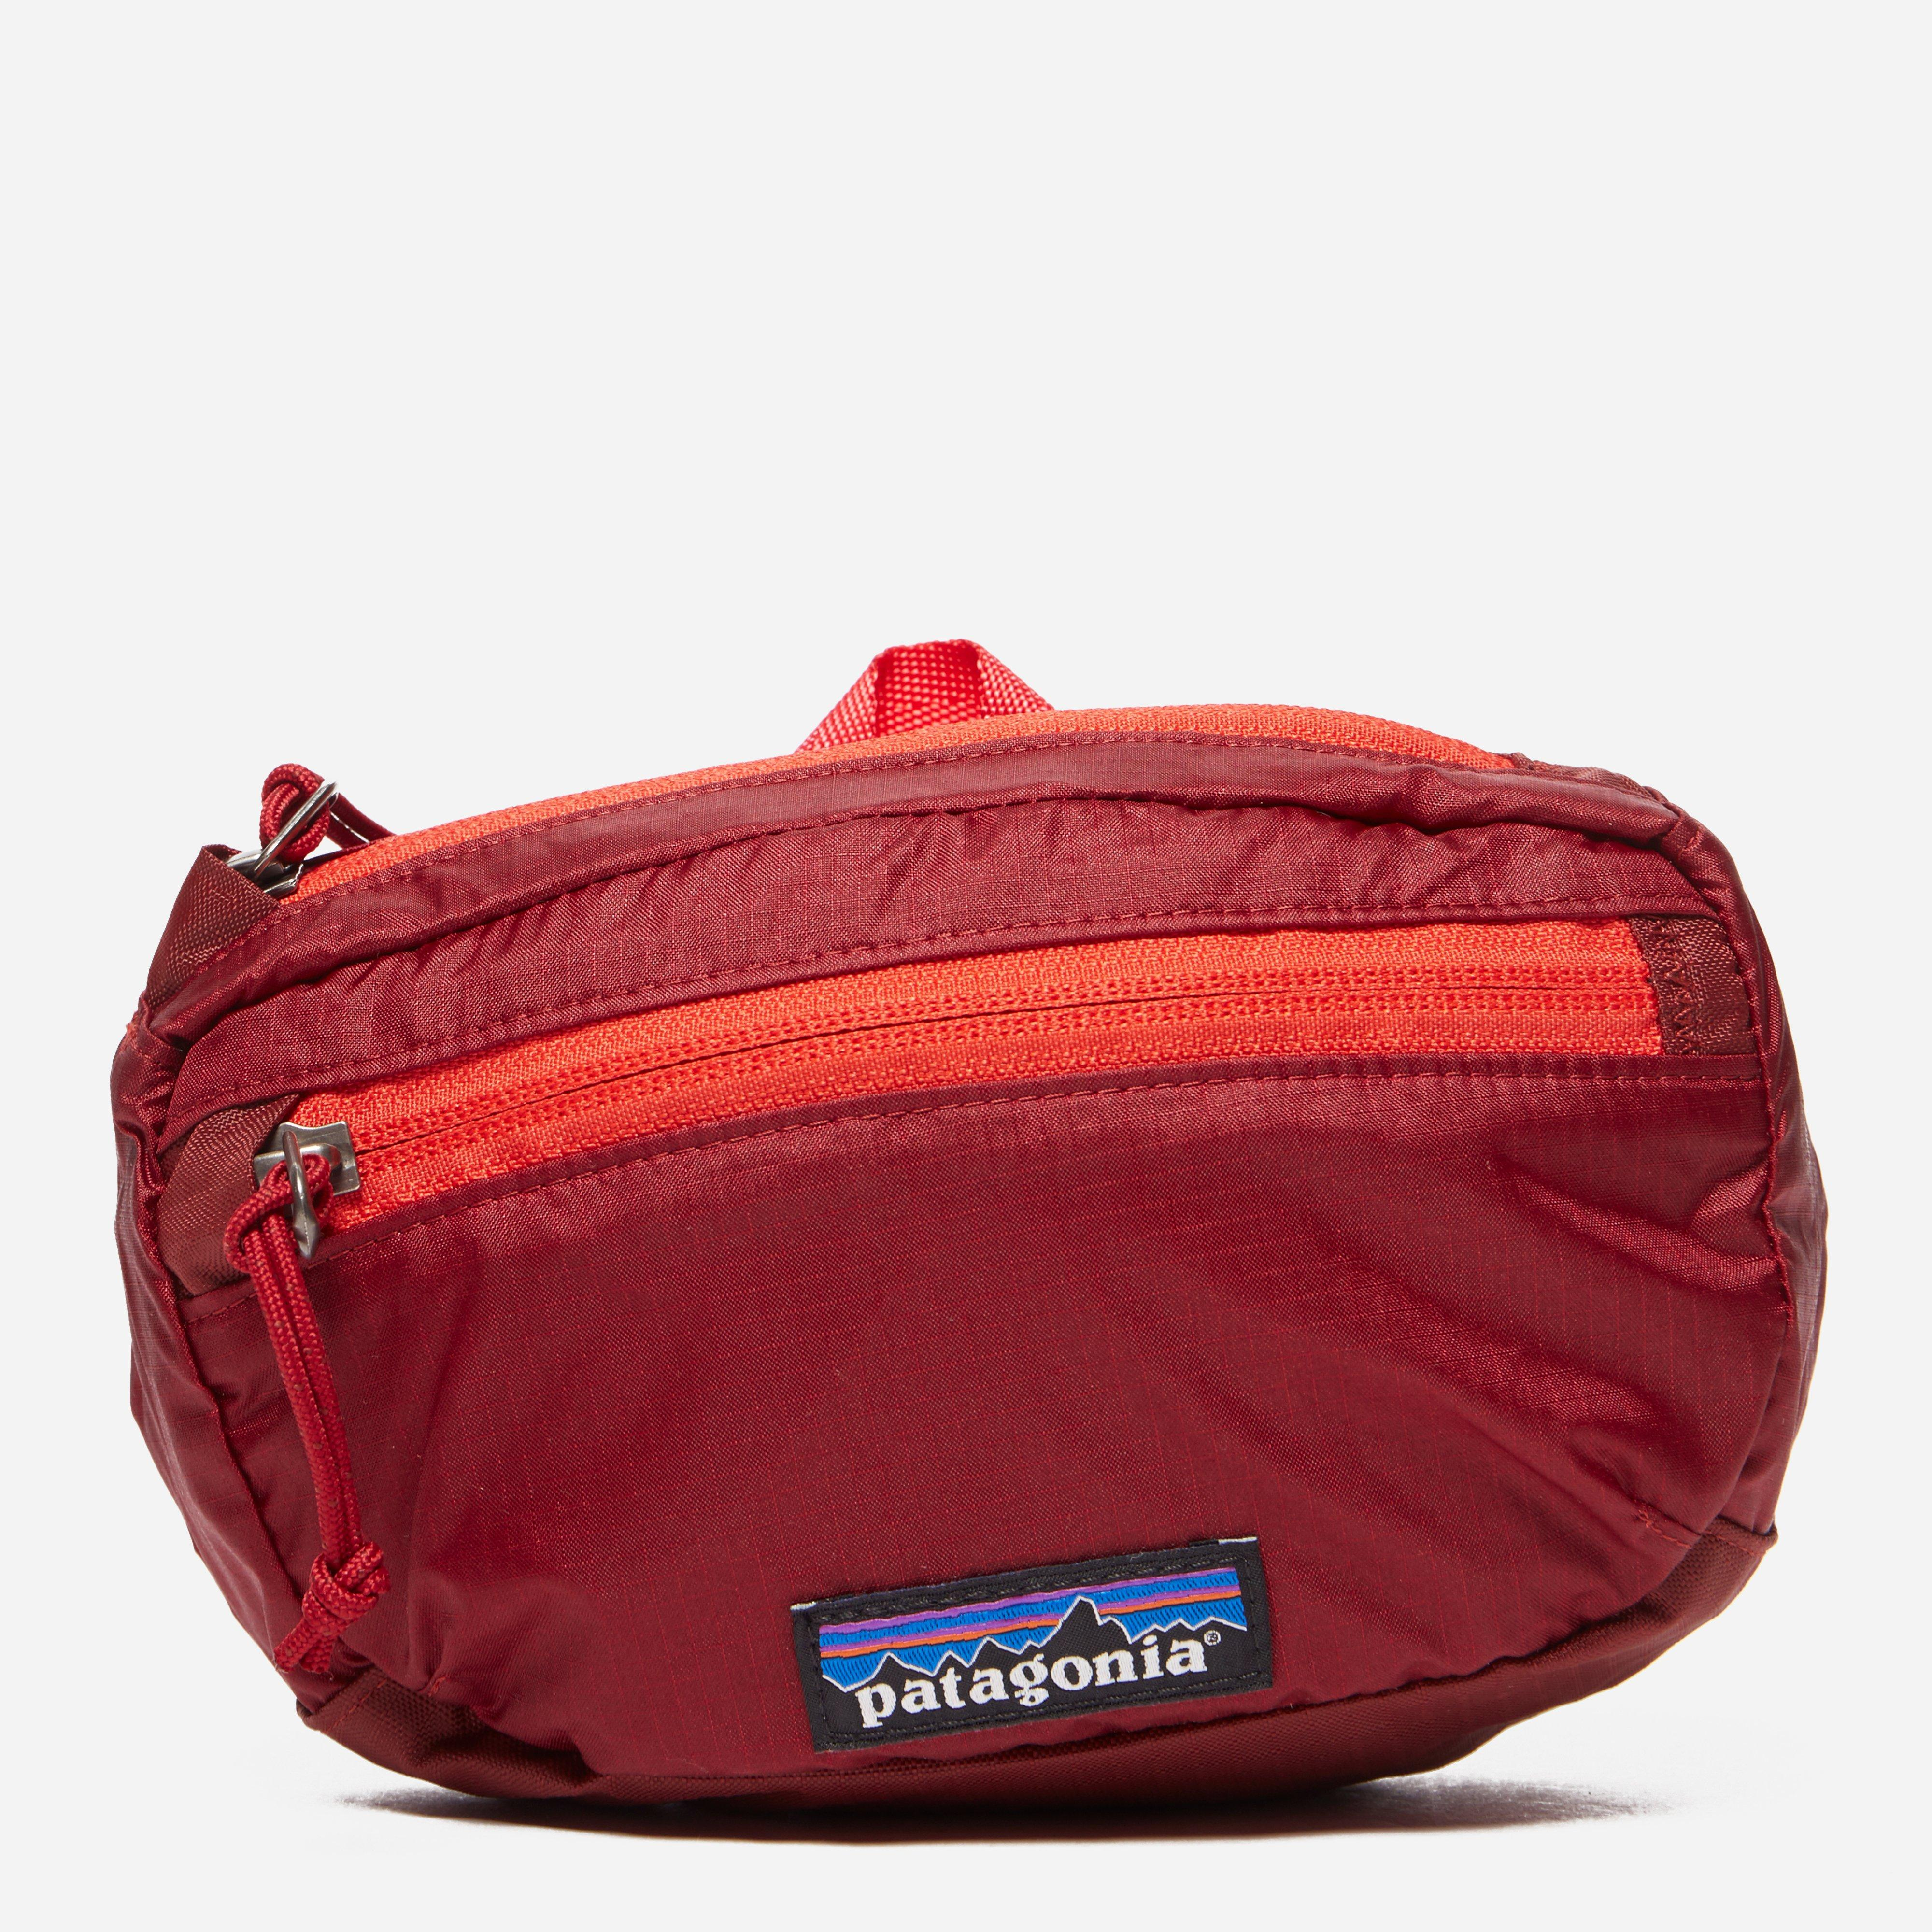 Patagonia LW Travel Mini Hip Pack